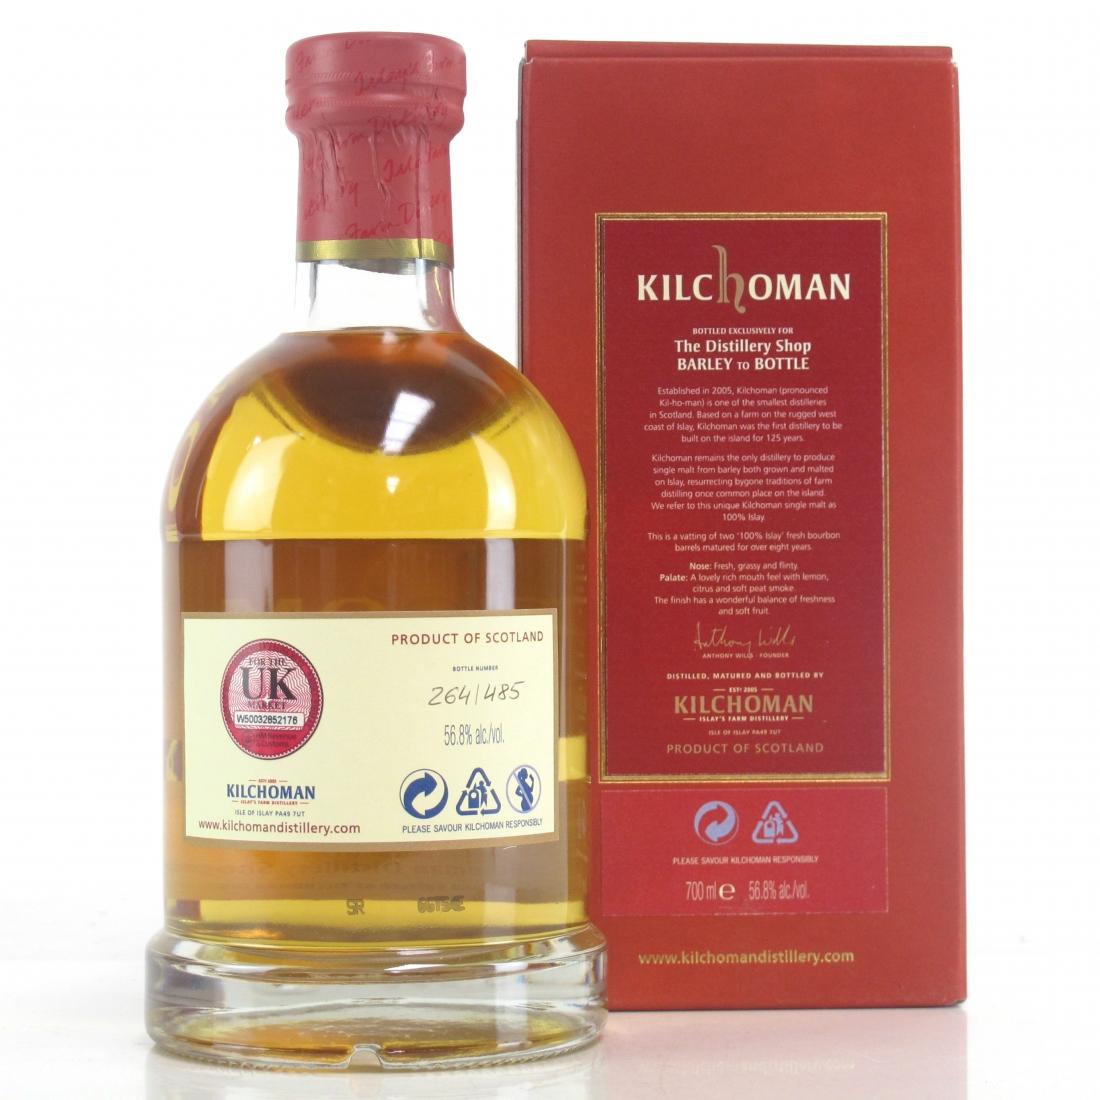 Kilchoman 2008 100% Islay Cask Vatting / Distillery Exclusive